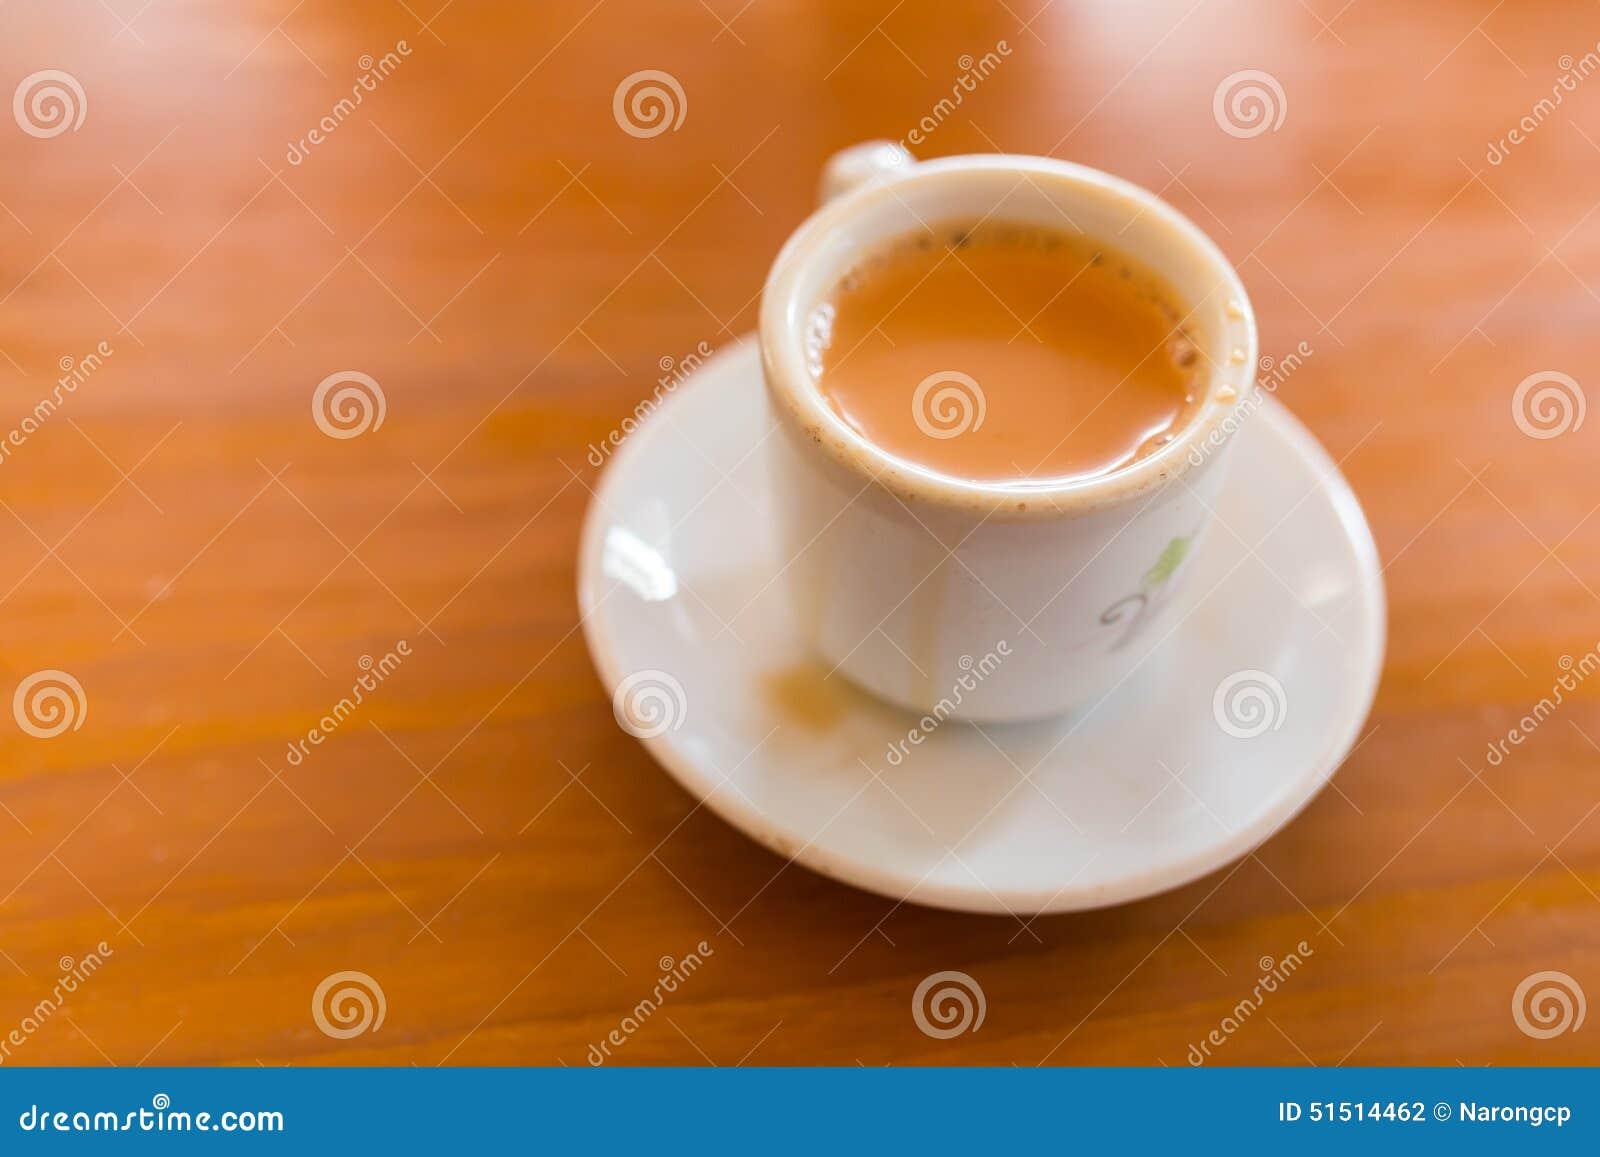 Cup Of Milk Tea Stock Photo - Image: 51514462